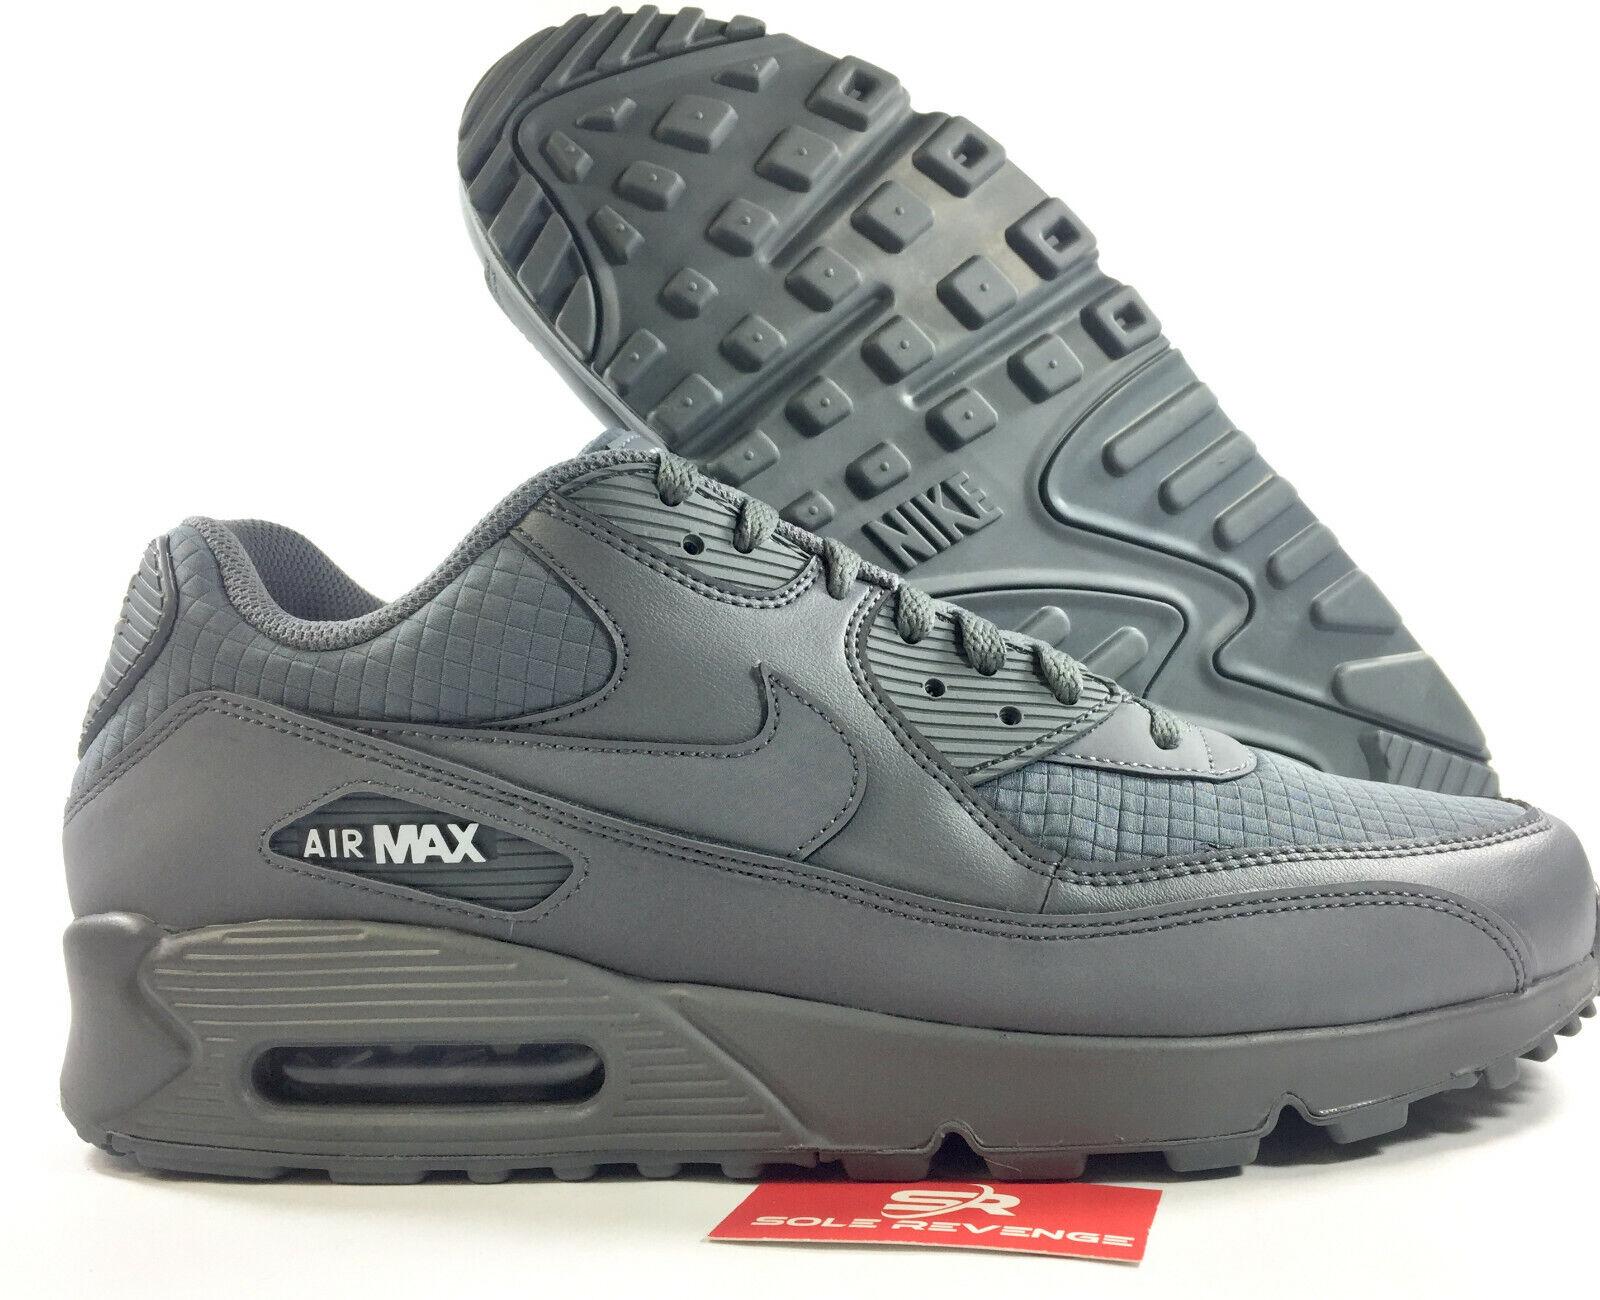 New NIKE AIR MAX 90 Essential - AJ1285-017 MEN'S Cool Grey White shoes d1